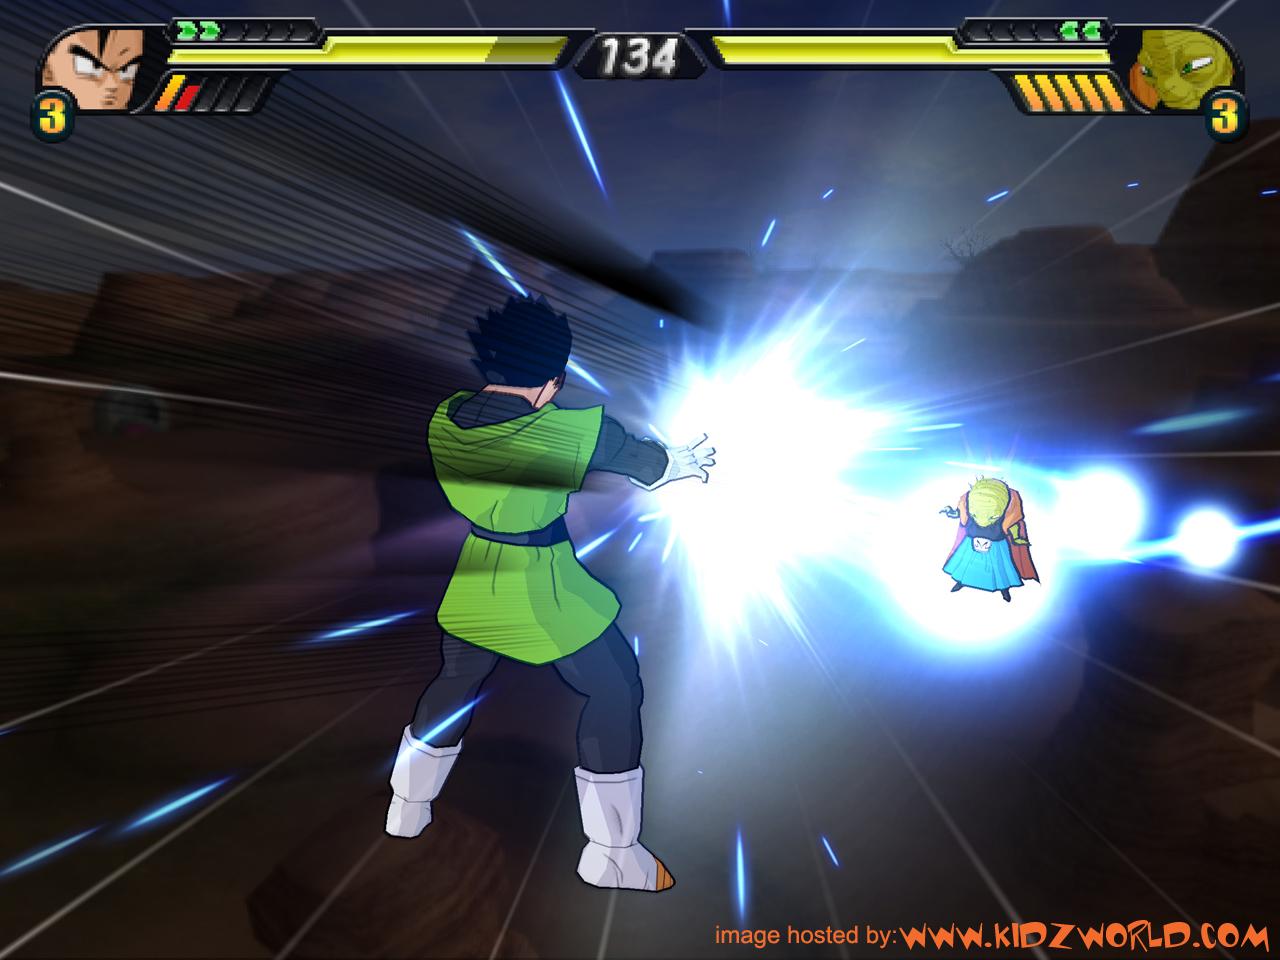 New Pokemon Games For Ps3 : Dragon ball z budokai tenkaichi transformers the